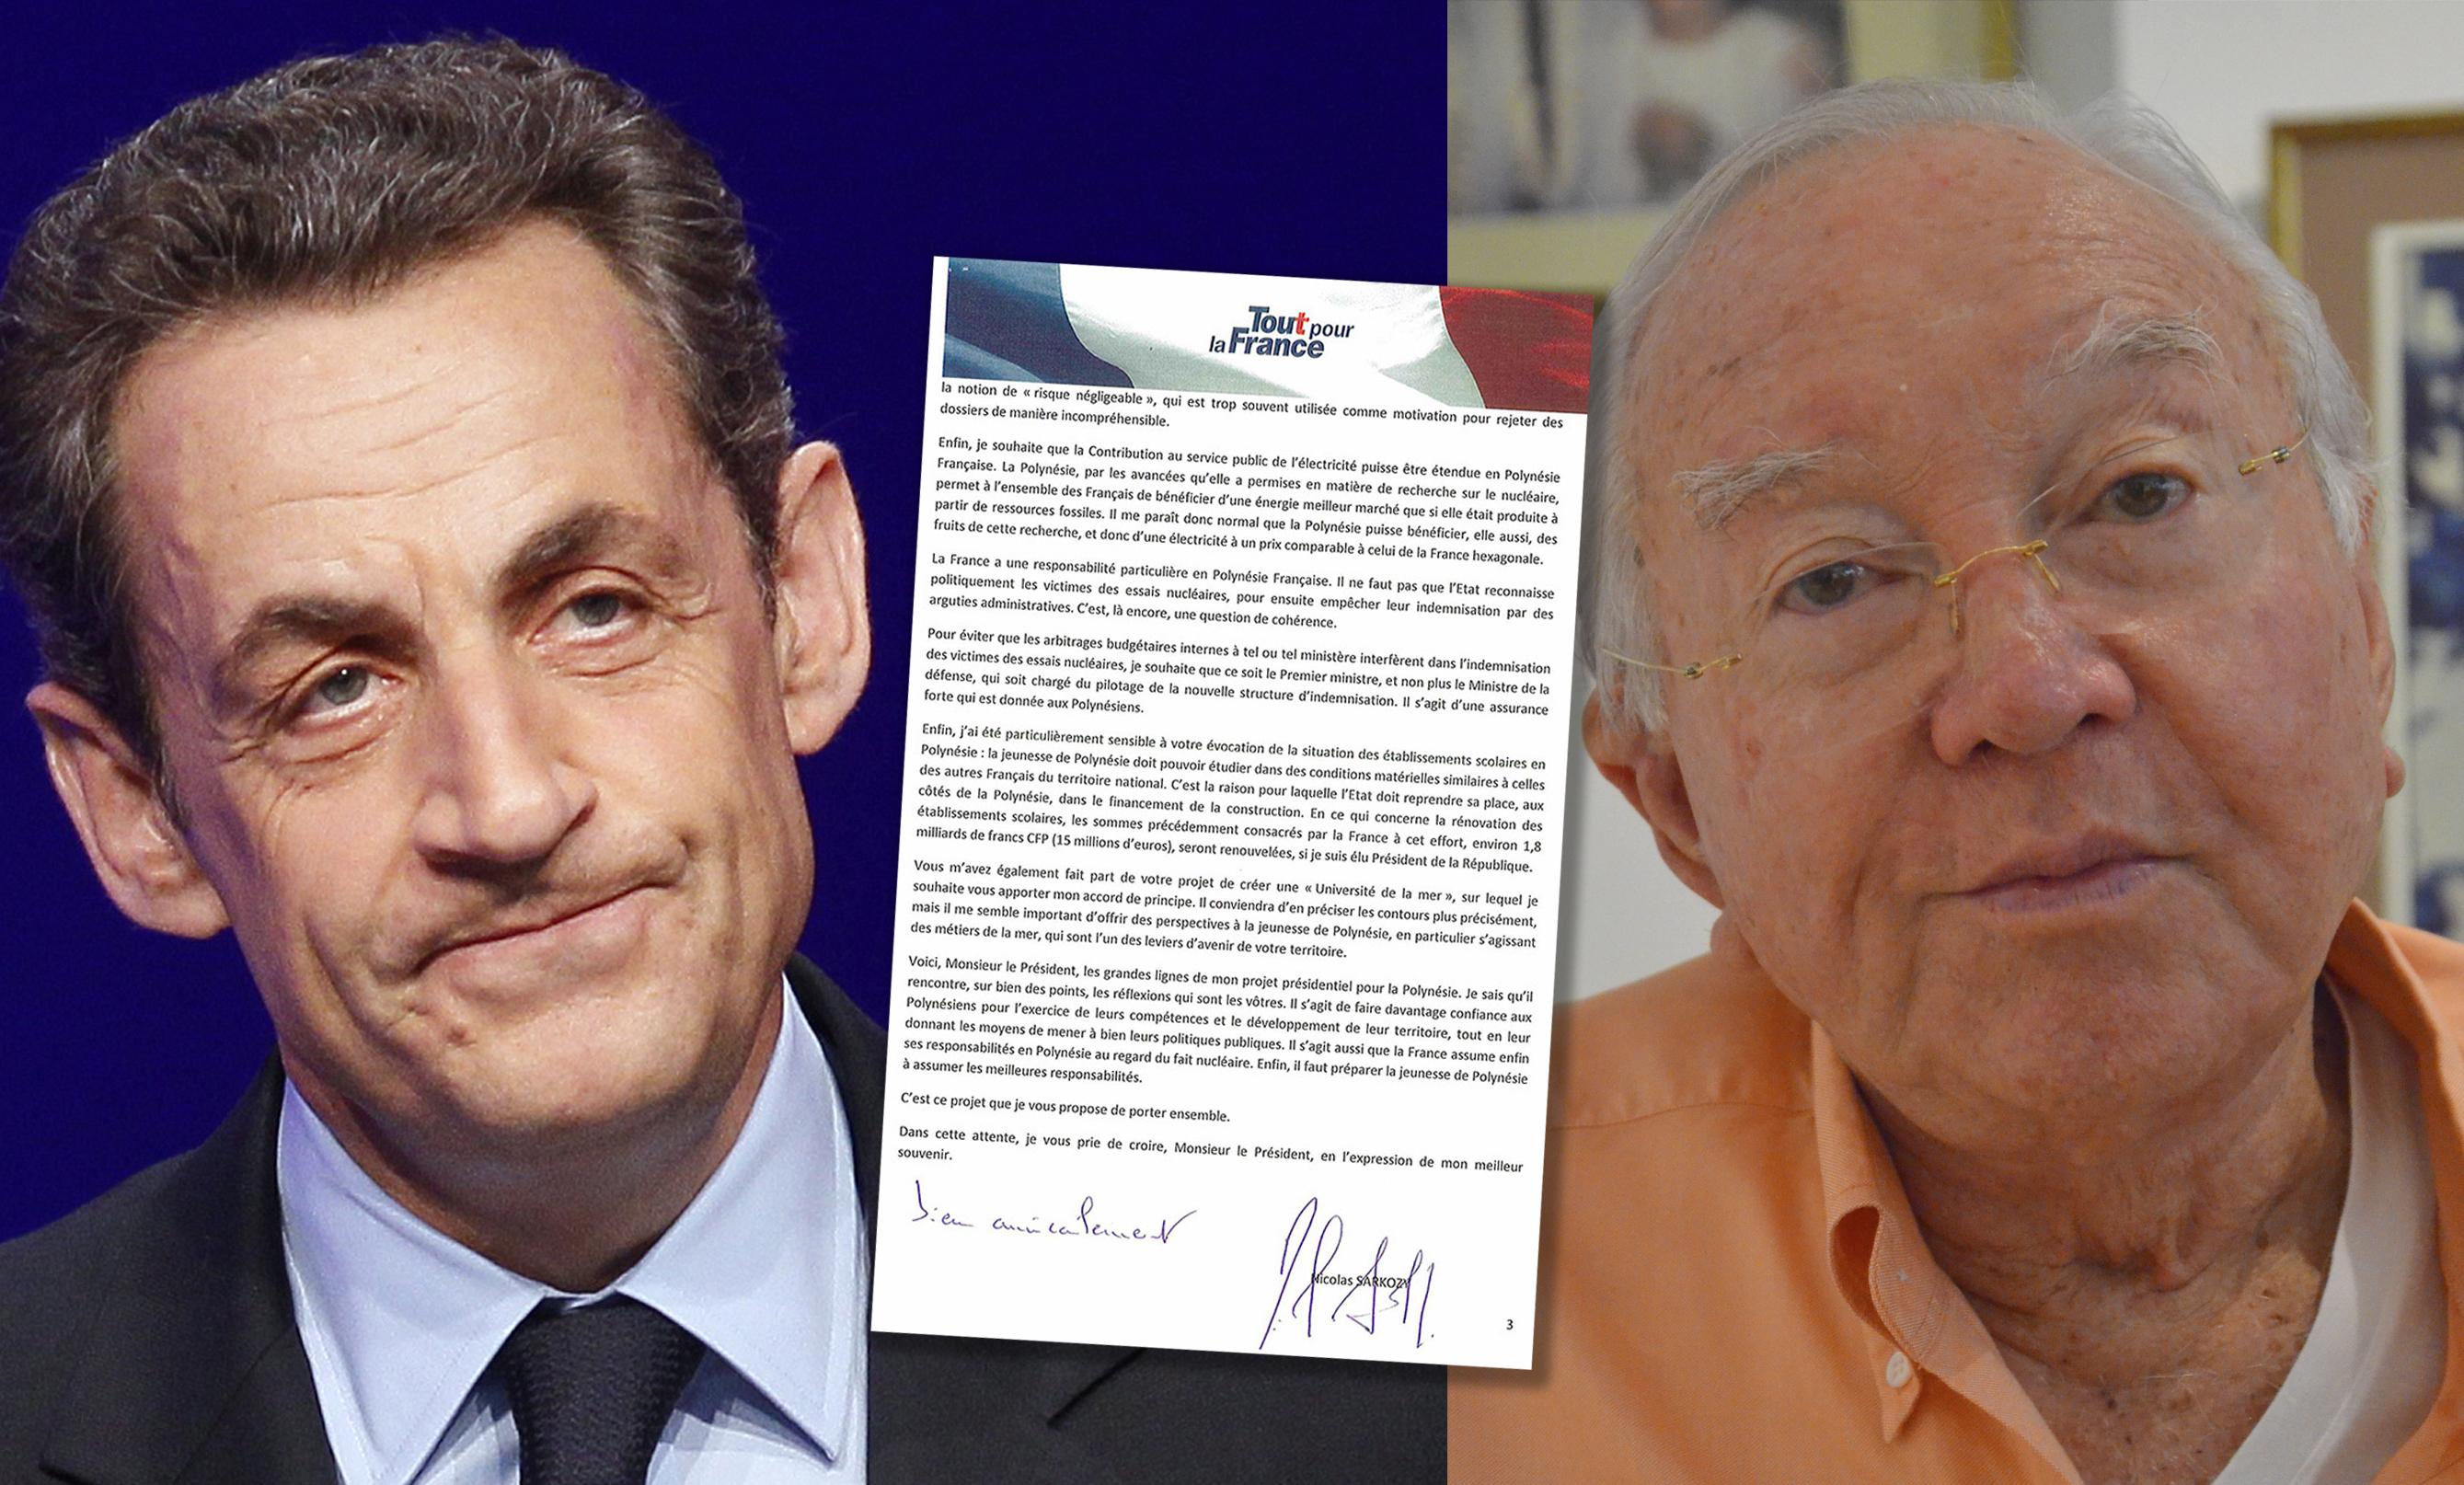 Les Promesses De Nicolas Sarkozy A Gaston Flosse